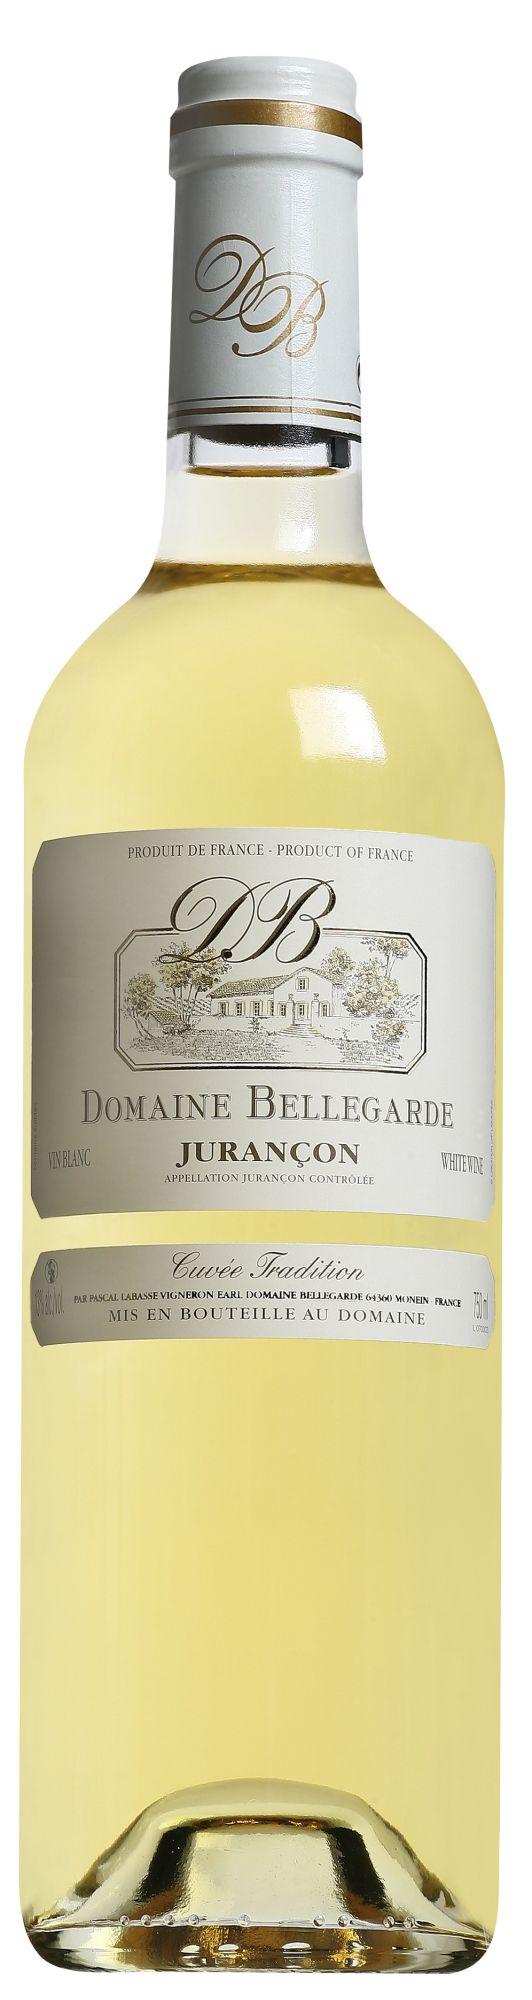 Domaine Bellegarde Jurançon Moelleux